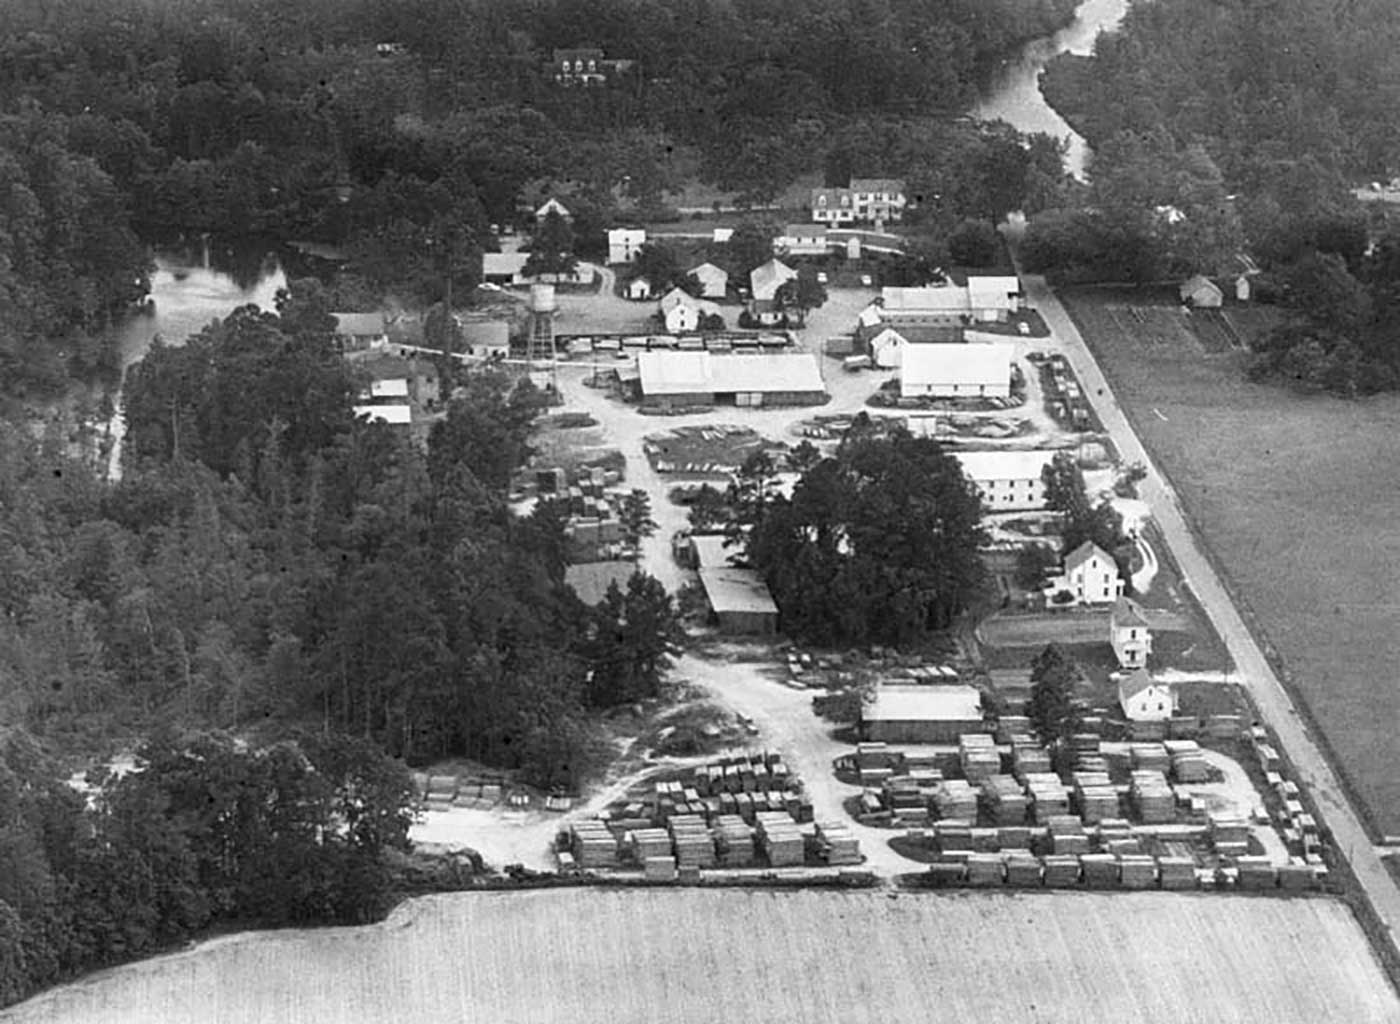 kirk-lumber-co-c-1950-img208